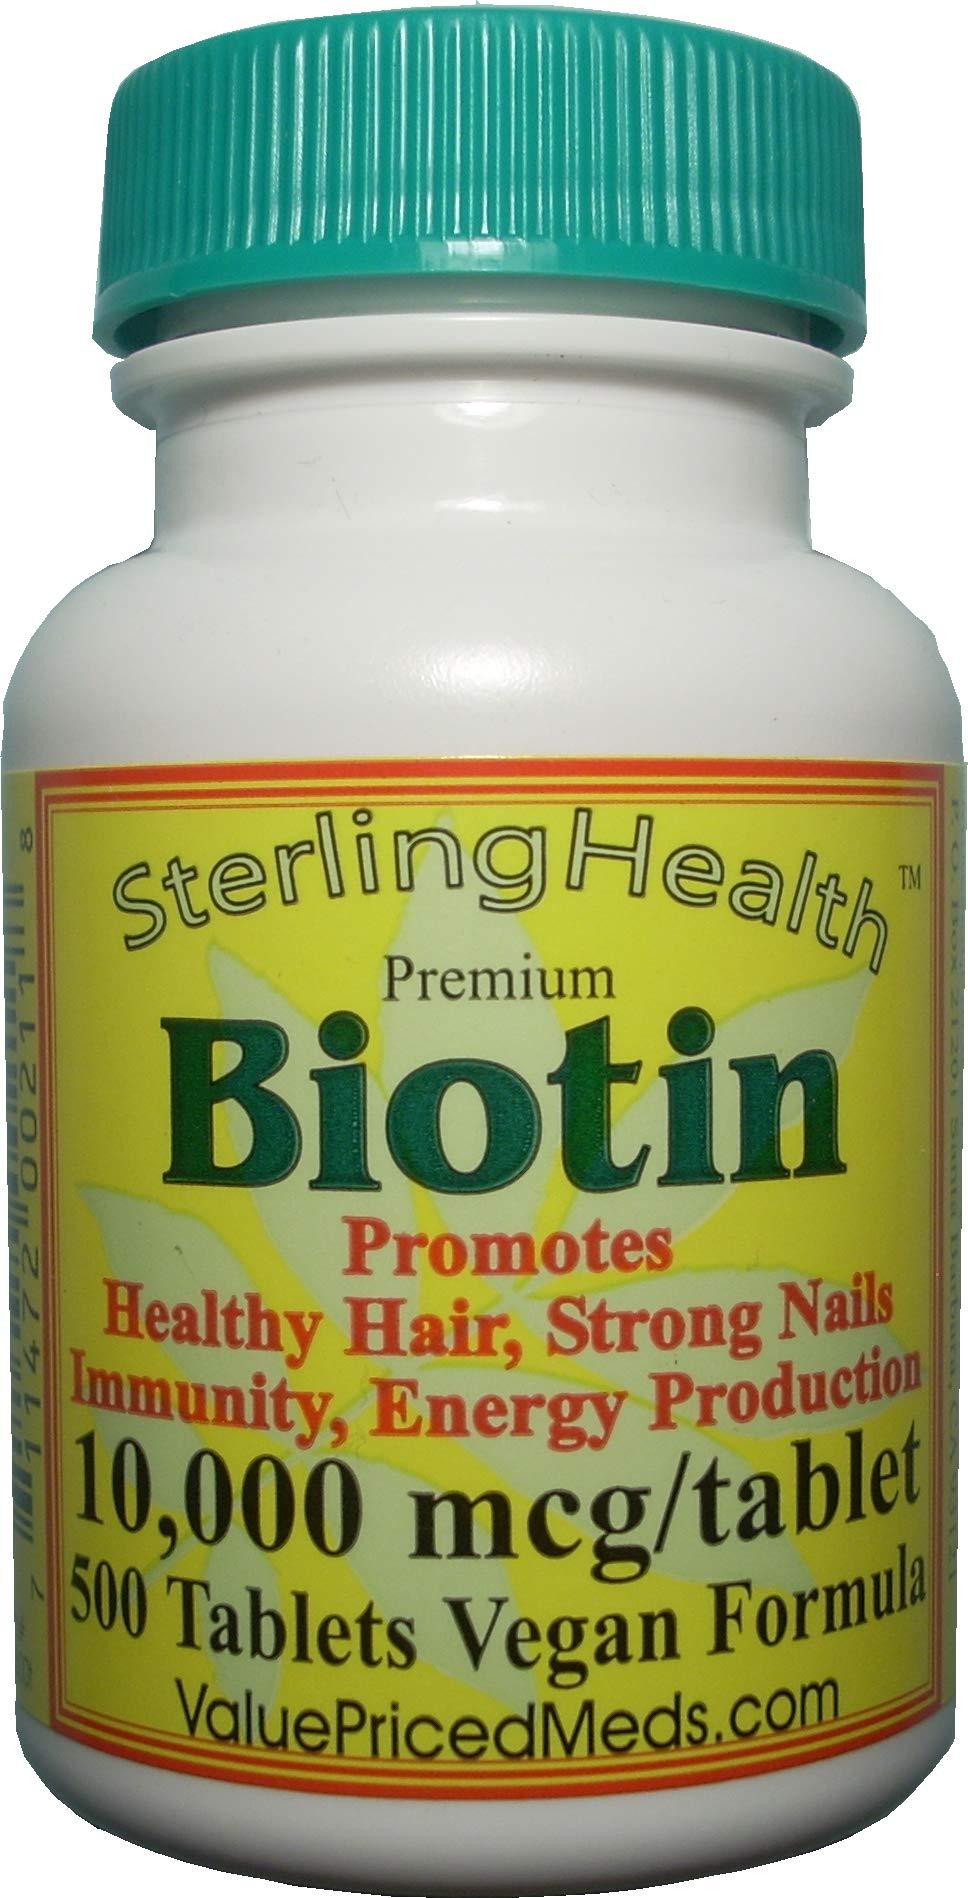 Biotin 500 tablets,10,000 mcg, for hair growth, skin, strong nails, biotin 10mg